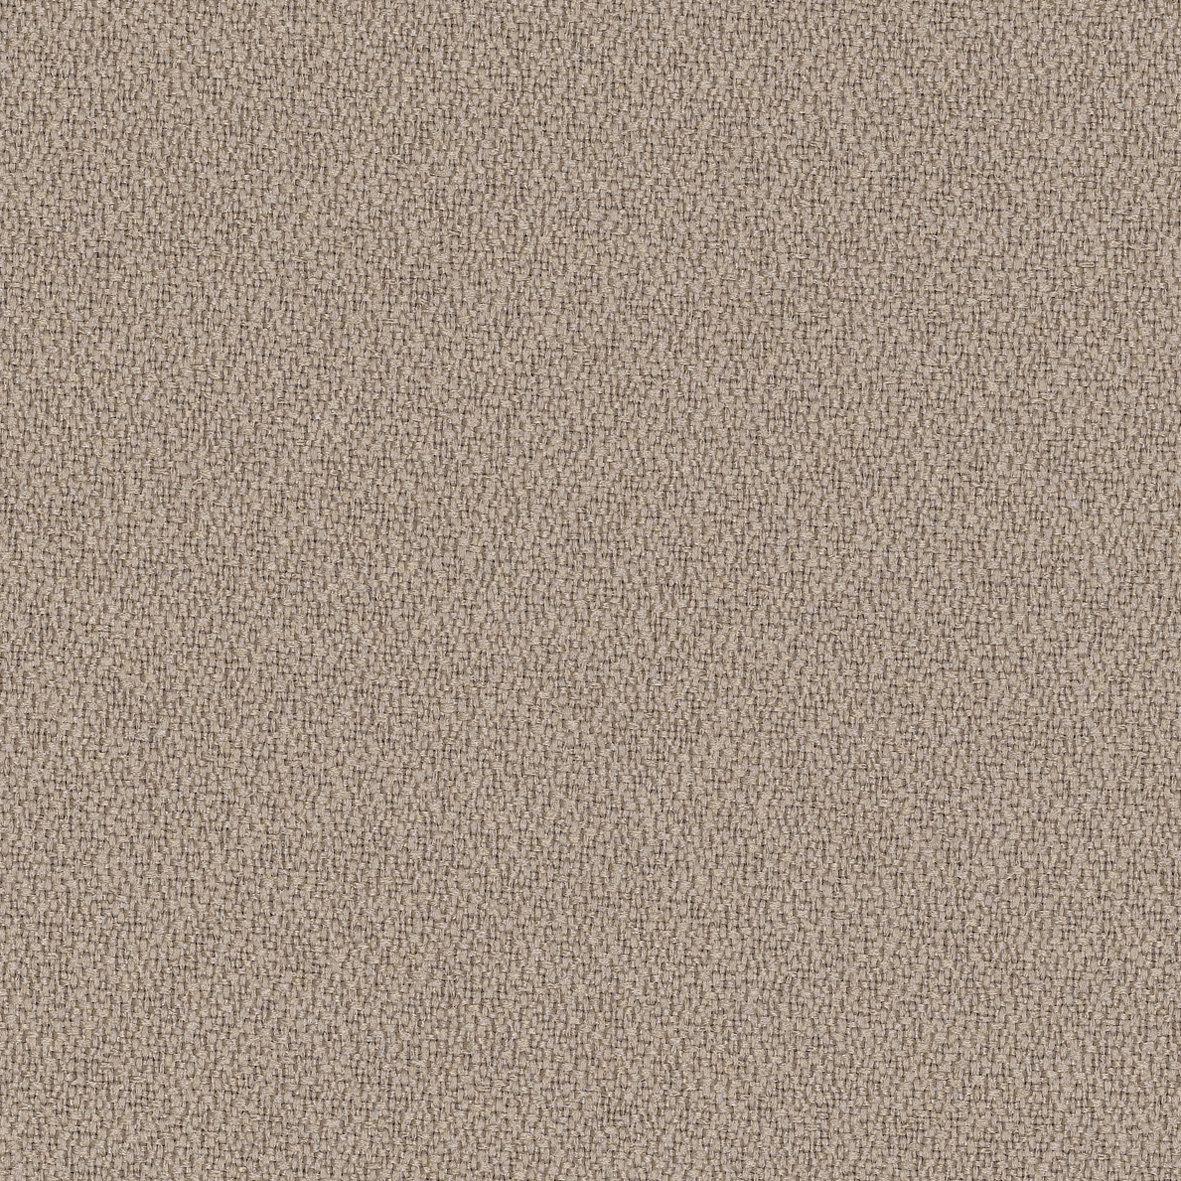 Softline bordskærmvæg beige B800xH450 mm